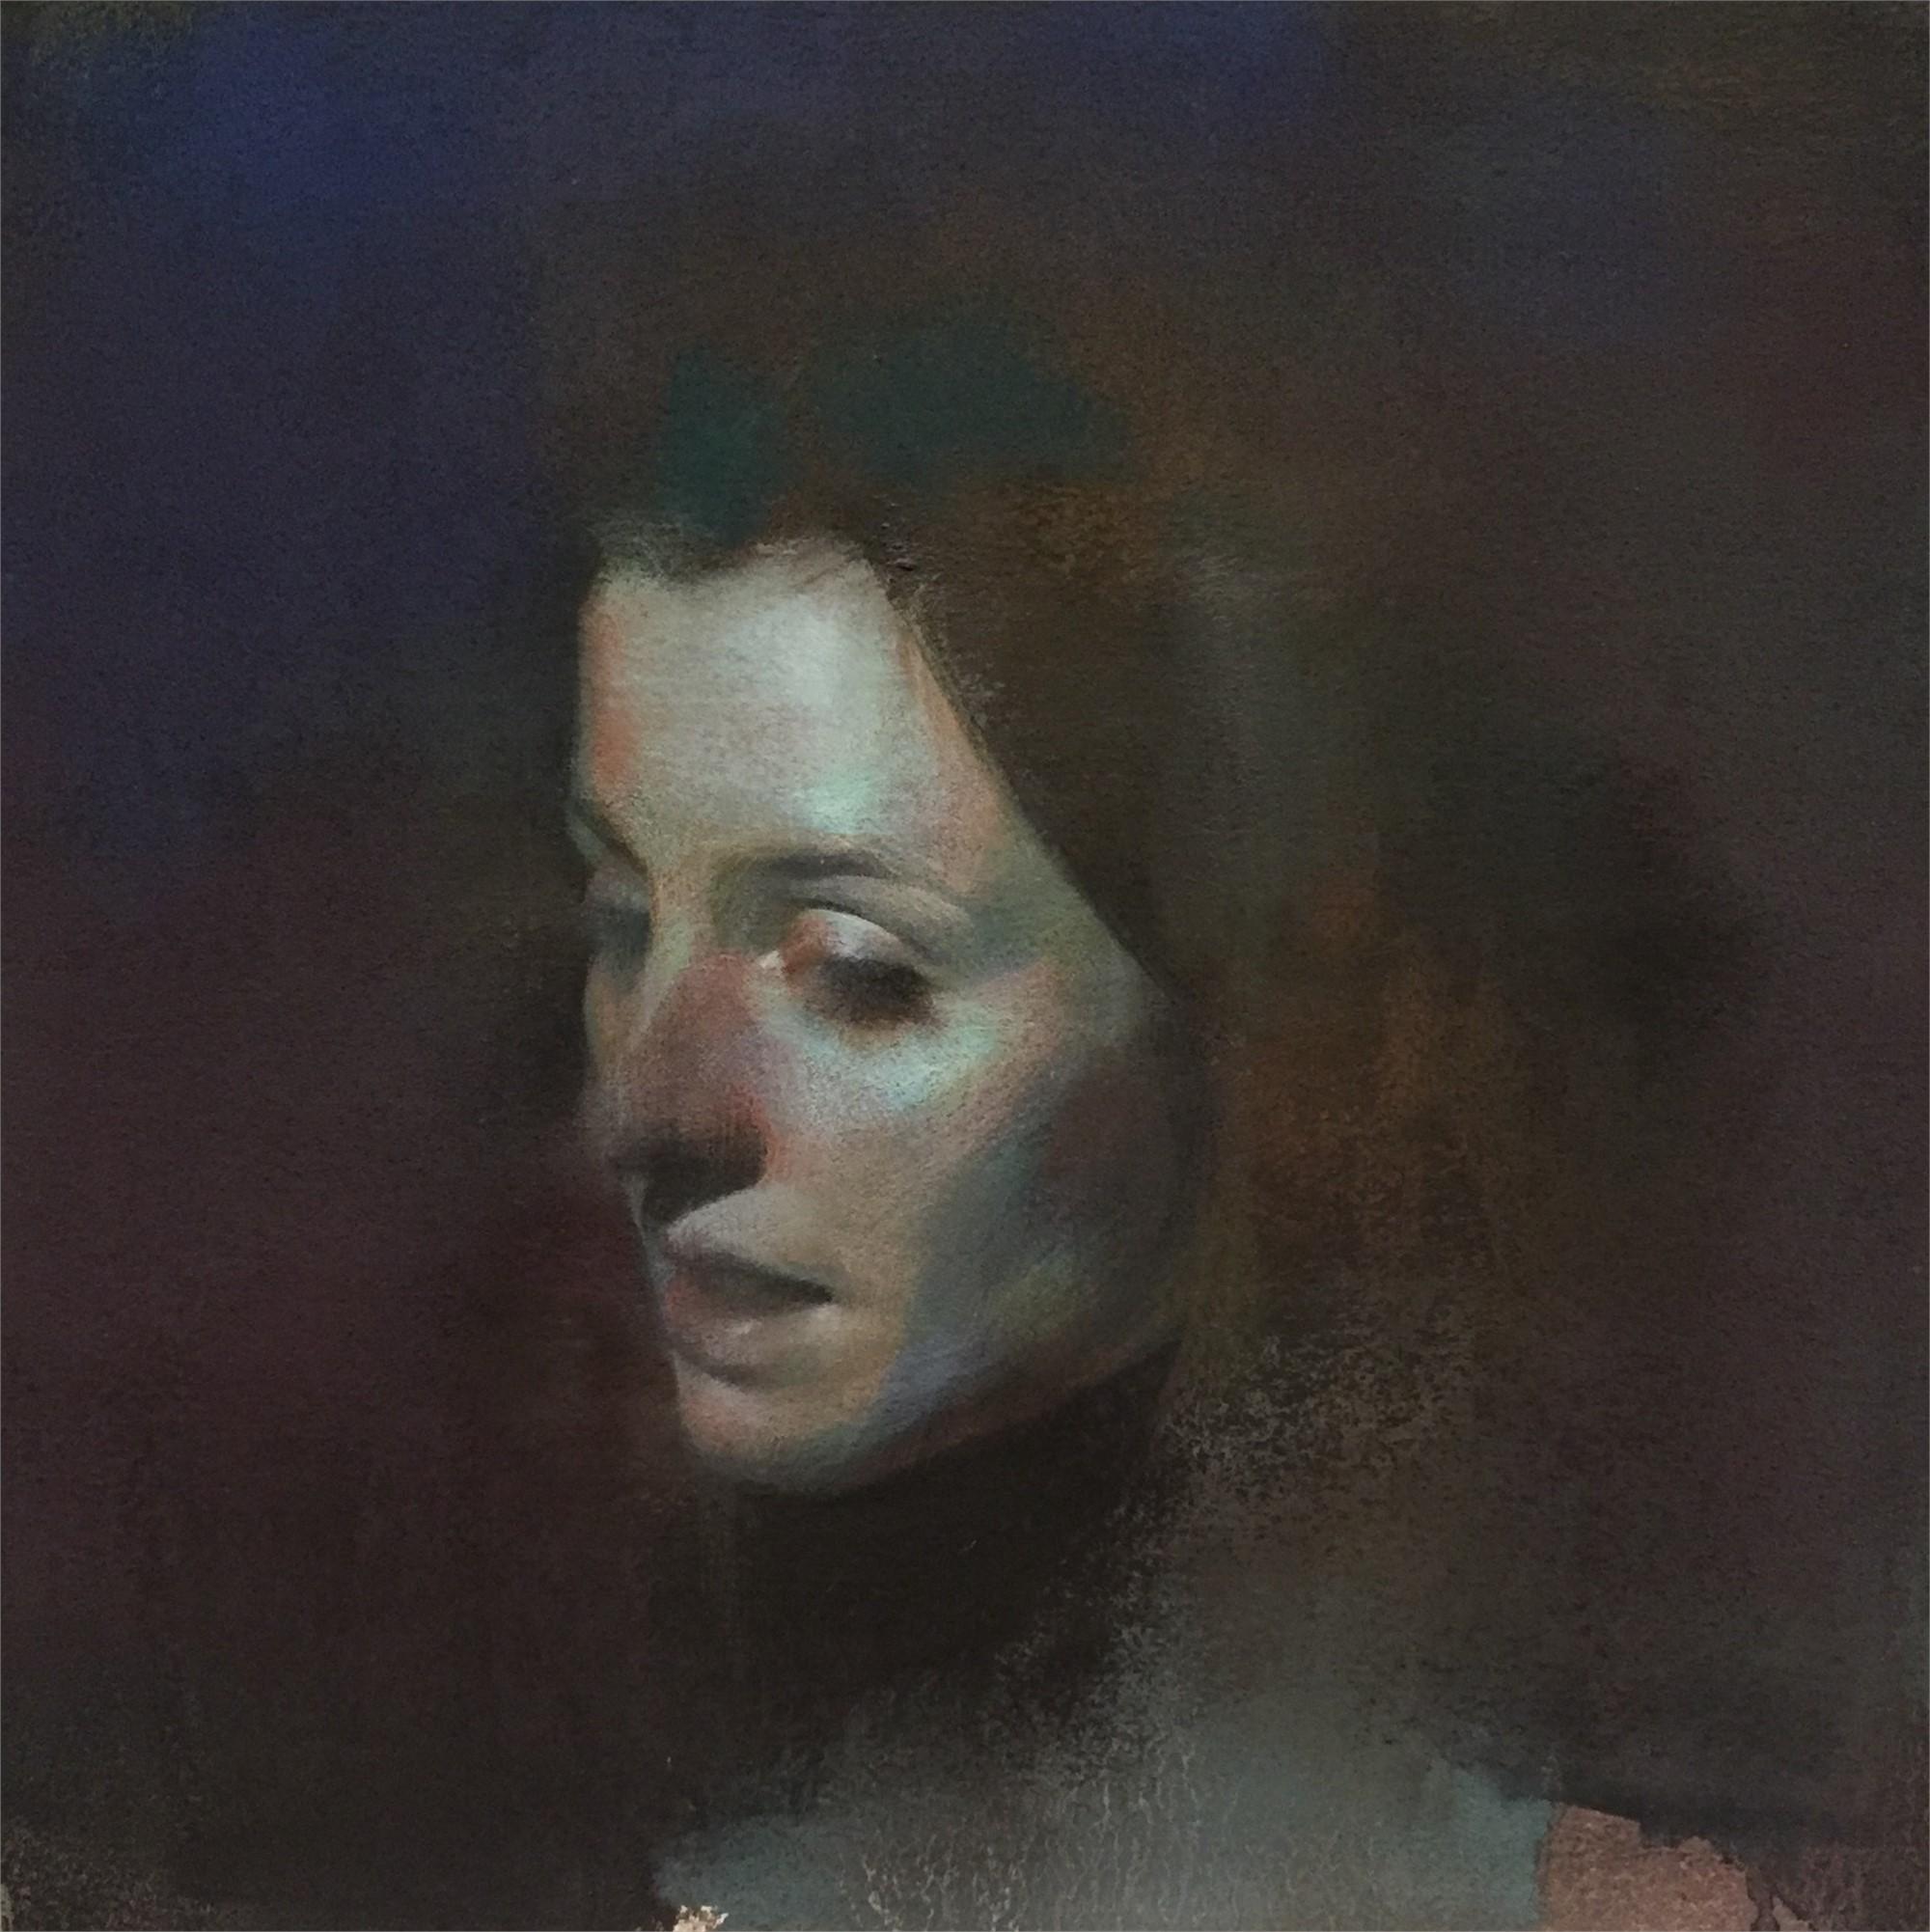 Head Study 1 by Yuriy Ibragimov